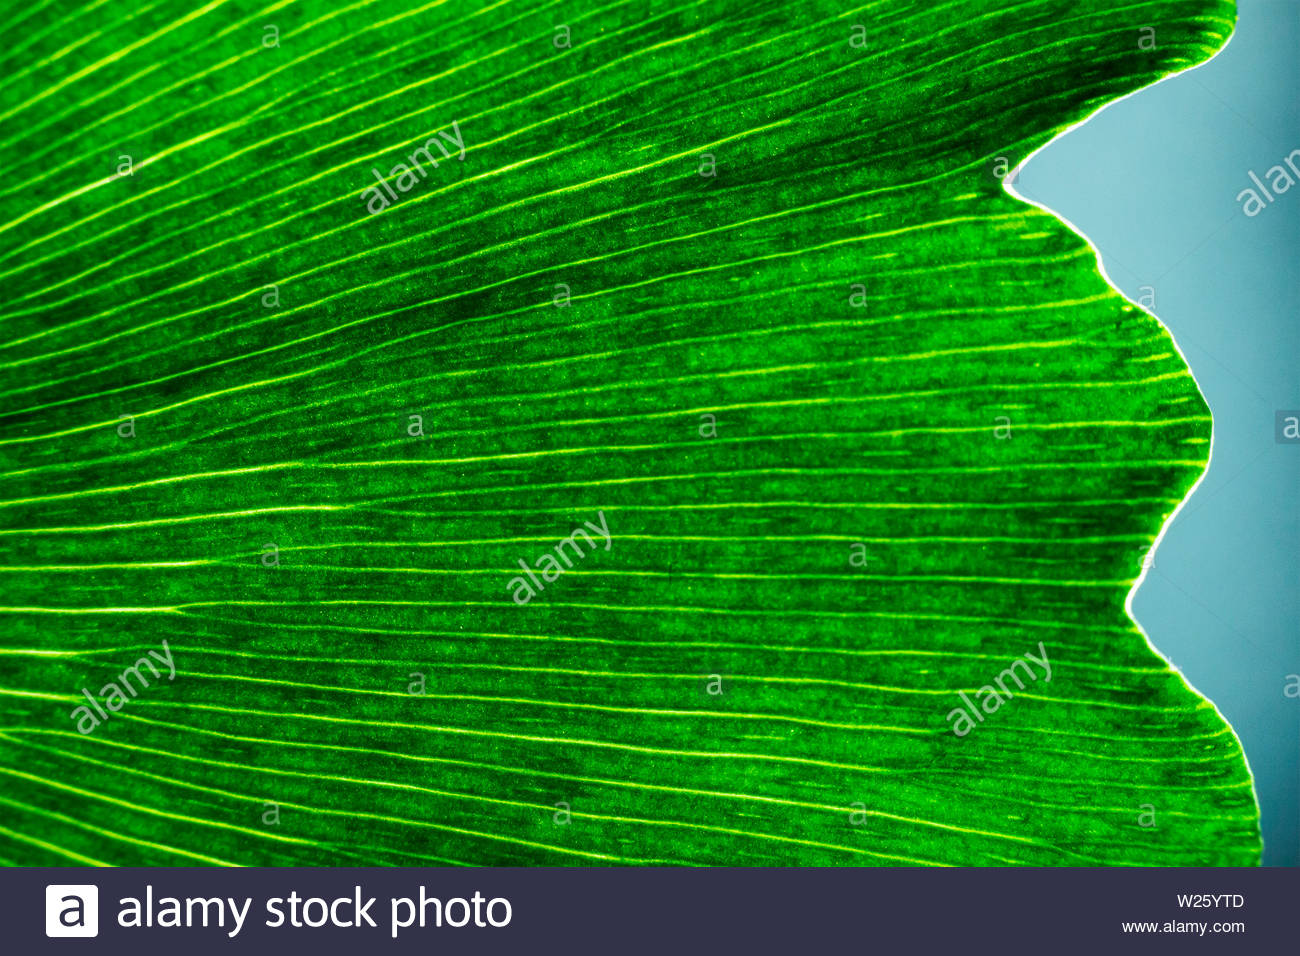 Ginkgo biloba leaf macro green eco background textured natural 1300x956